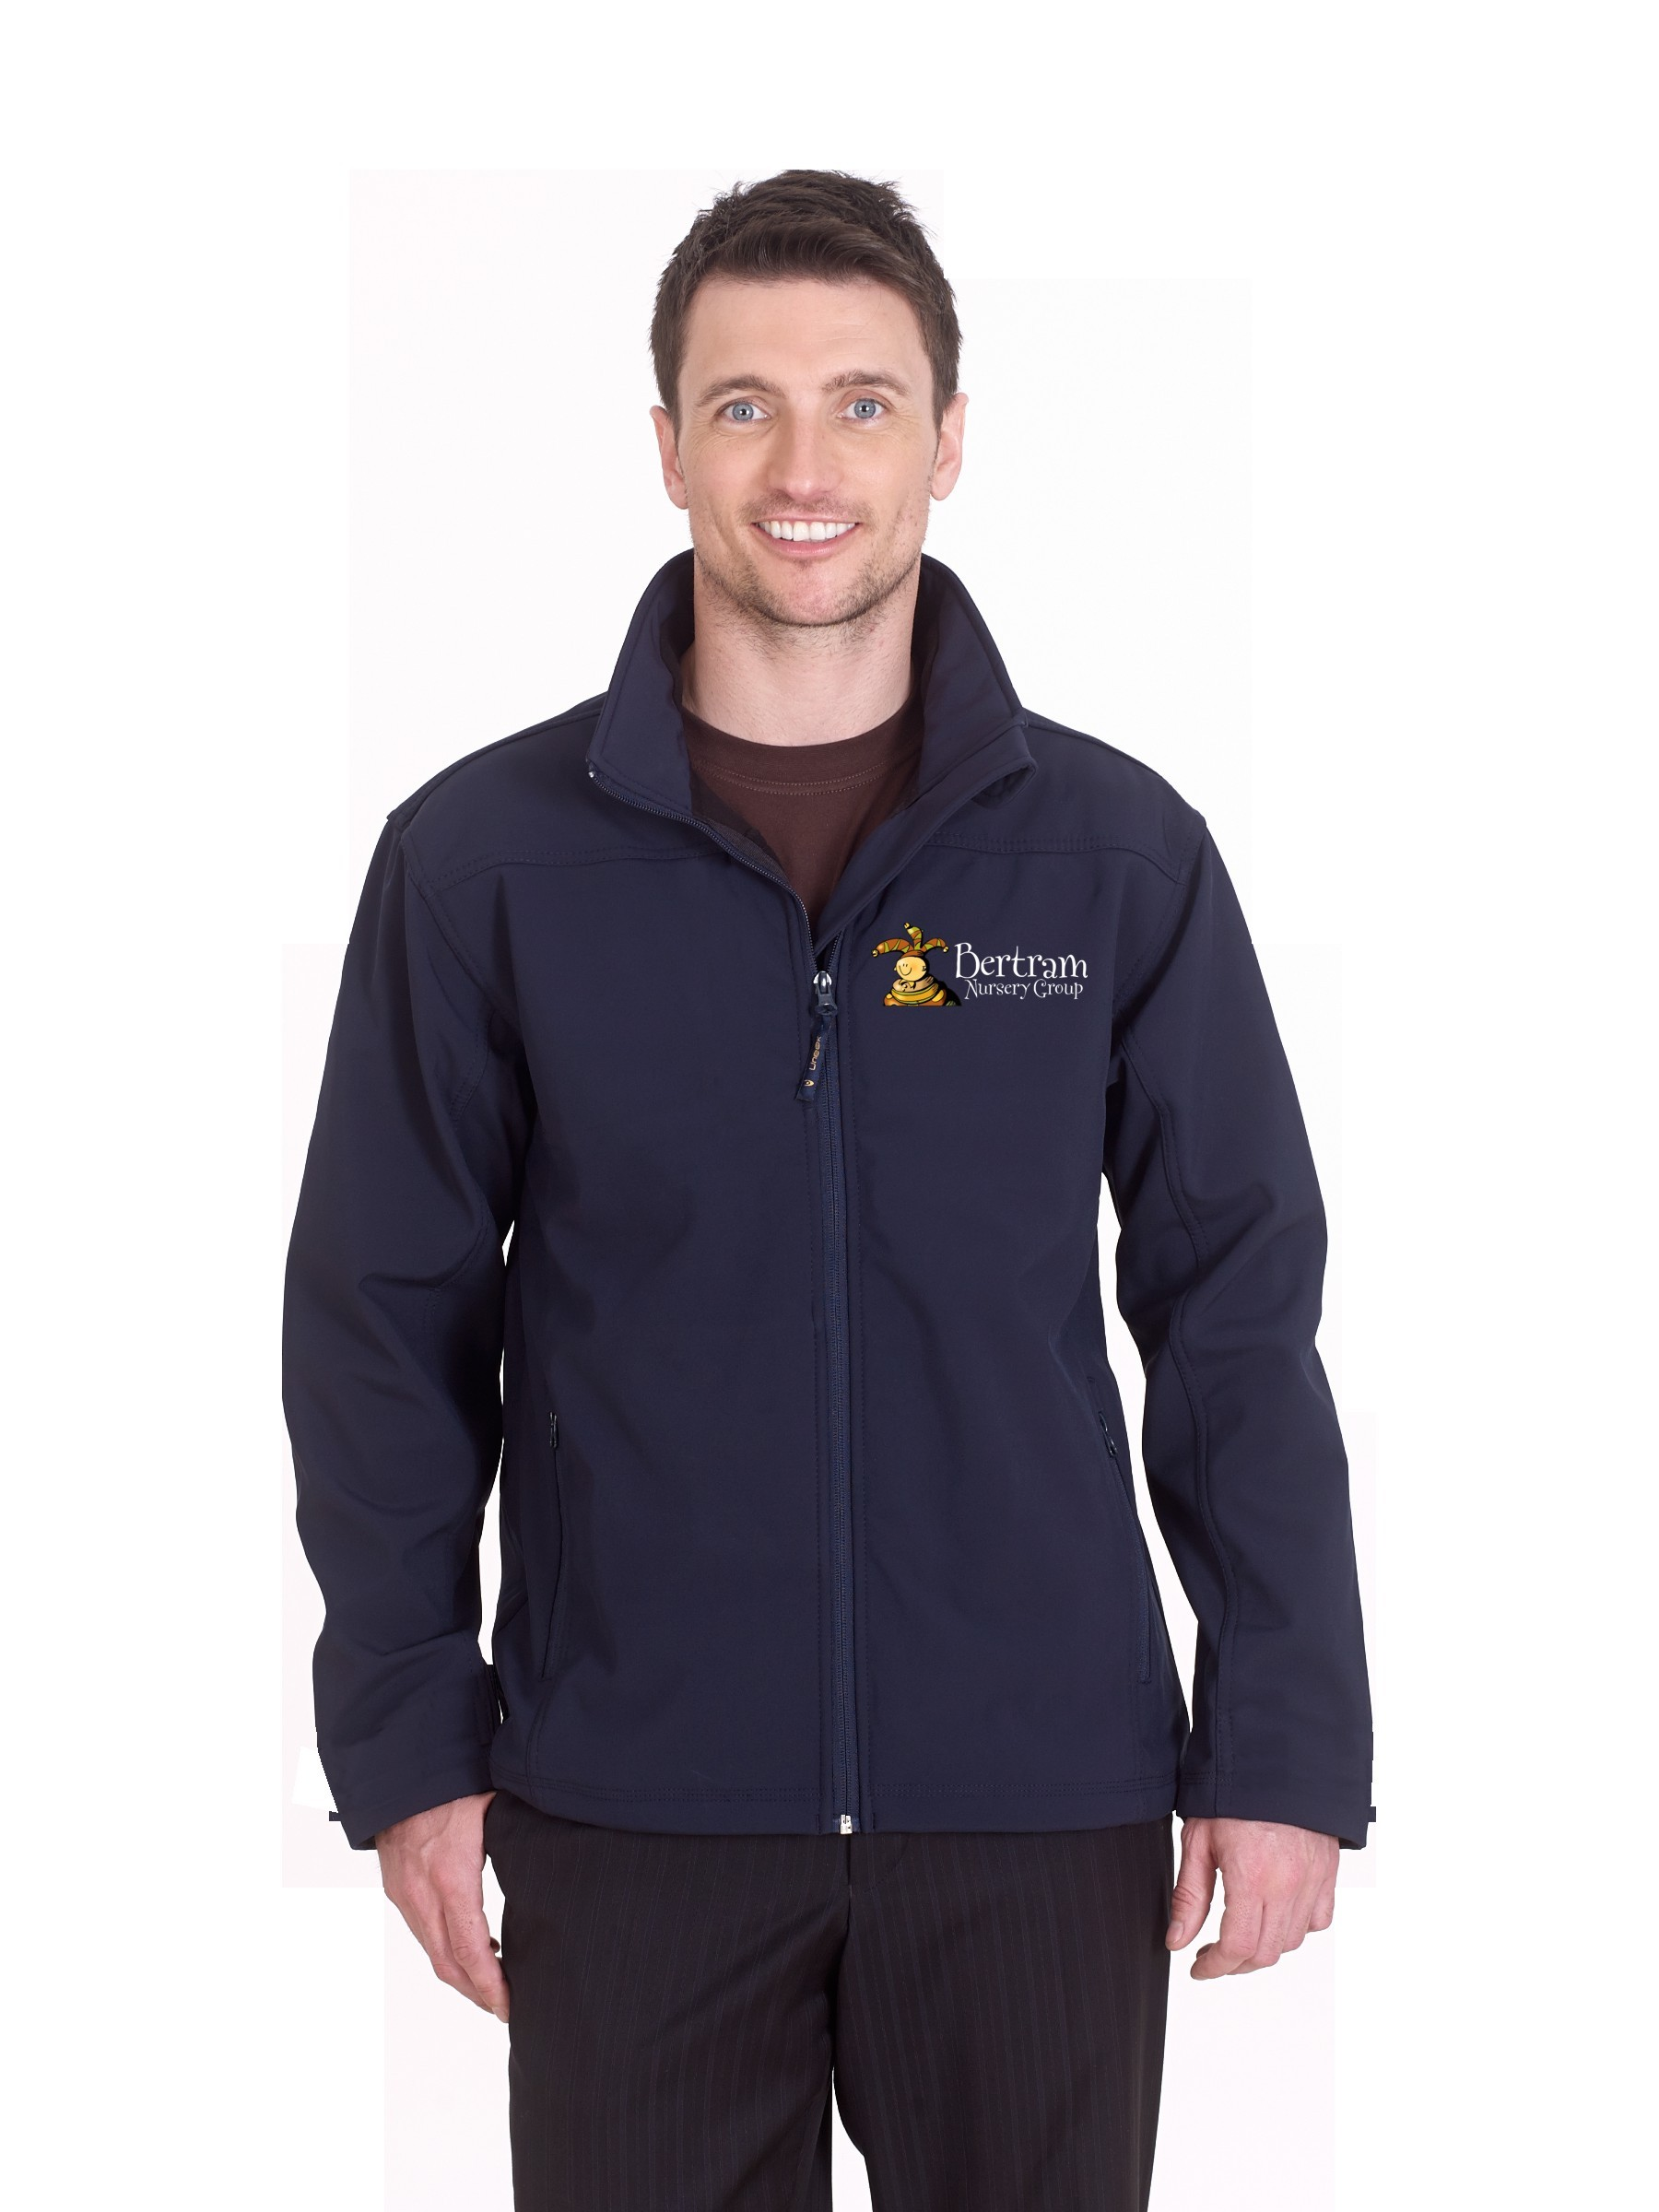 Bertram UK Classic Full Zip Soft Shell Jacket